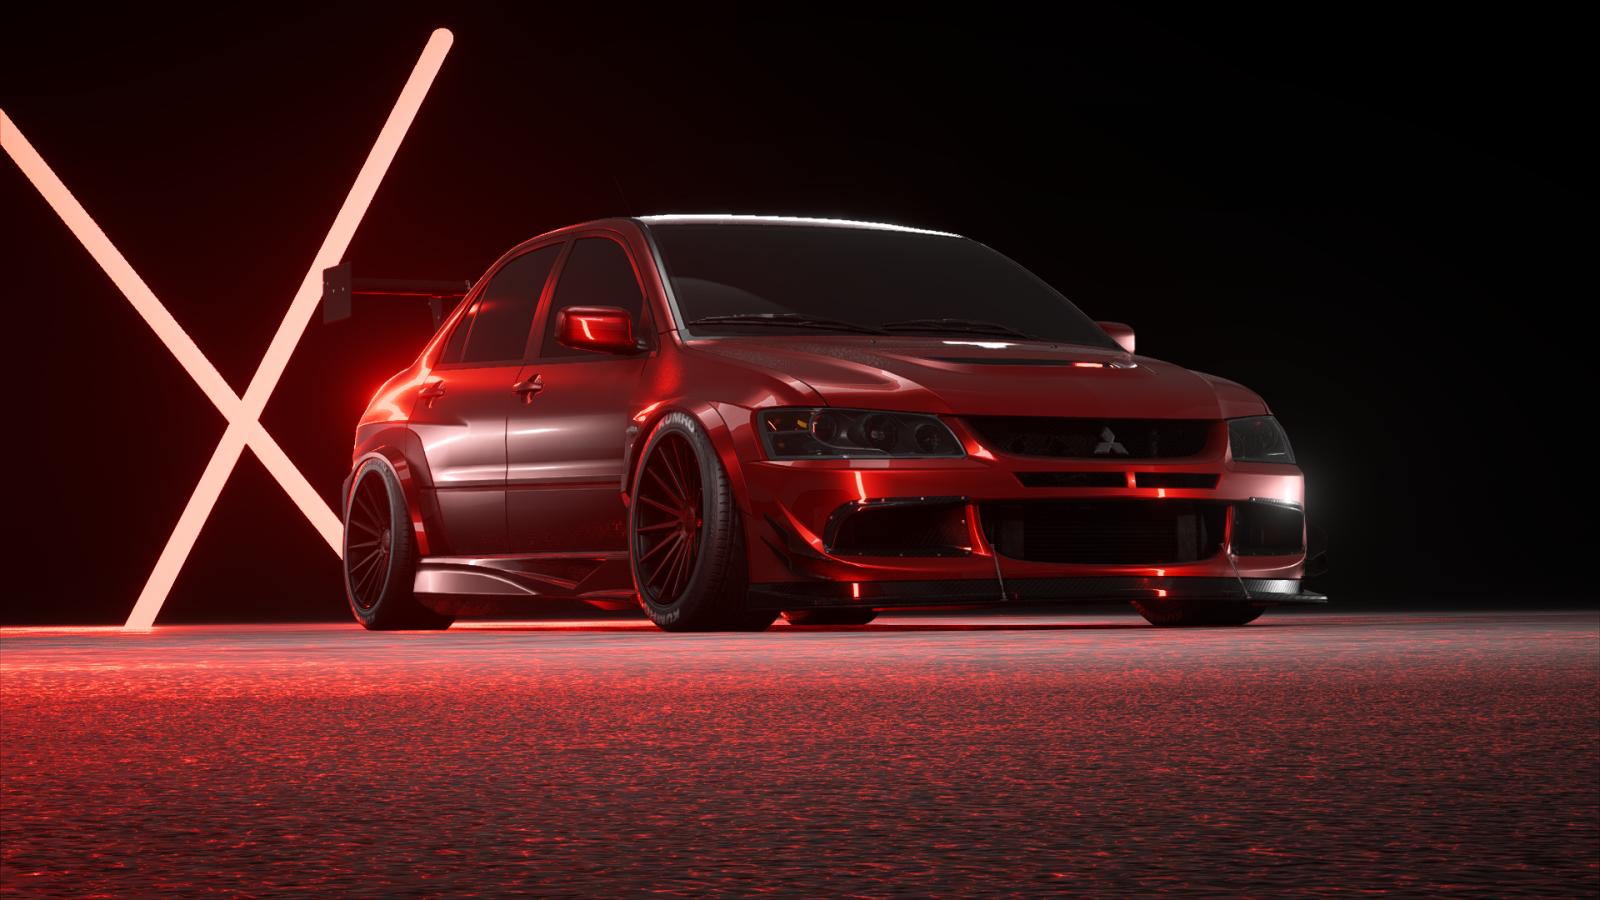 Wallpaper : evo, Mitsubishi Lancer Evo X, red, Need for ...